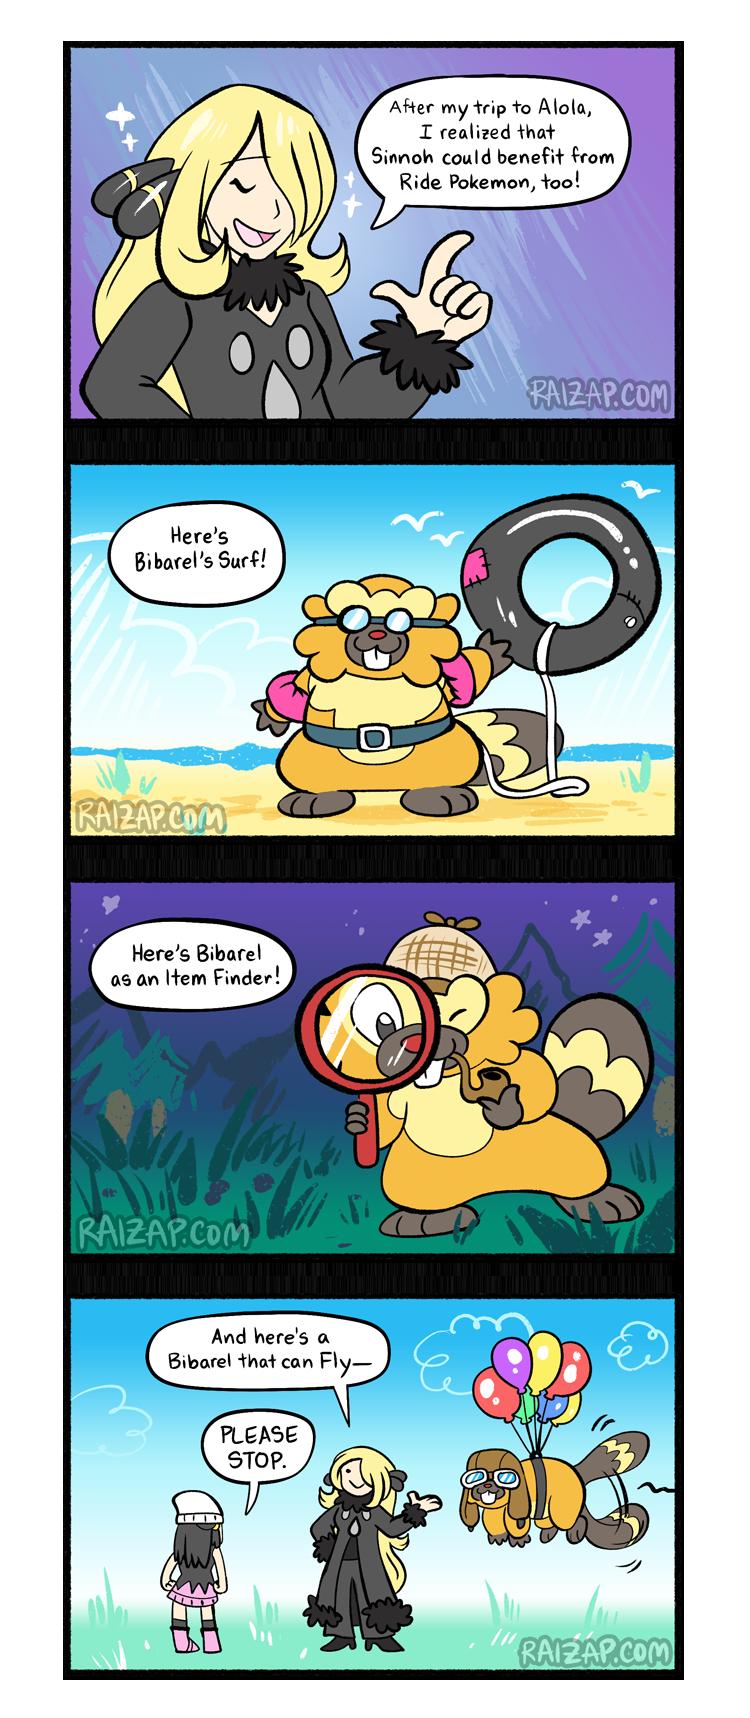 Bibarel the Ride Pokemon